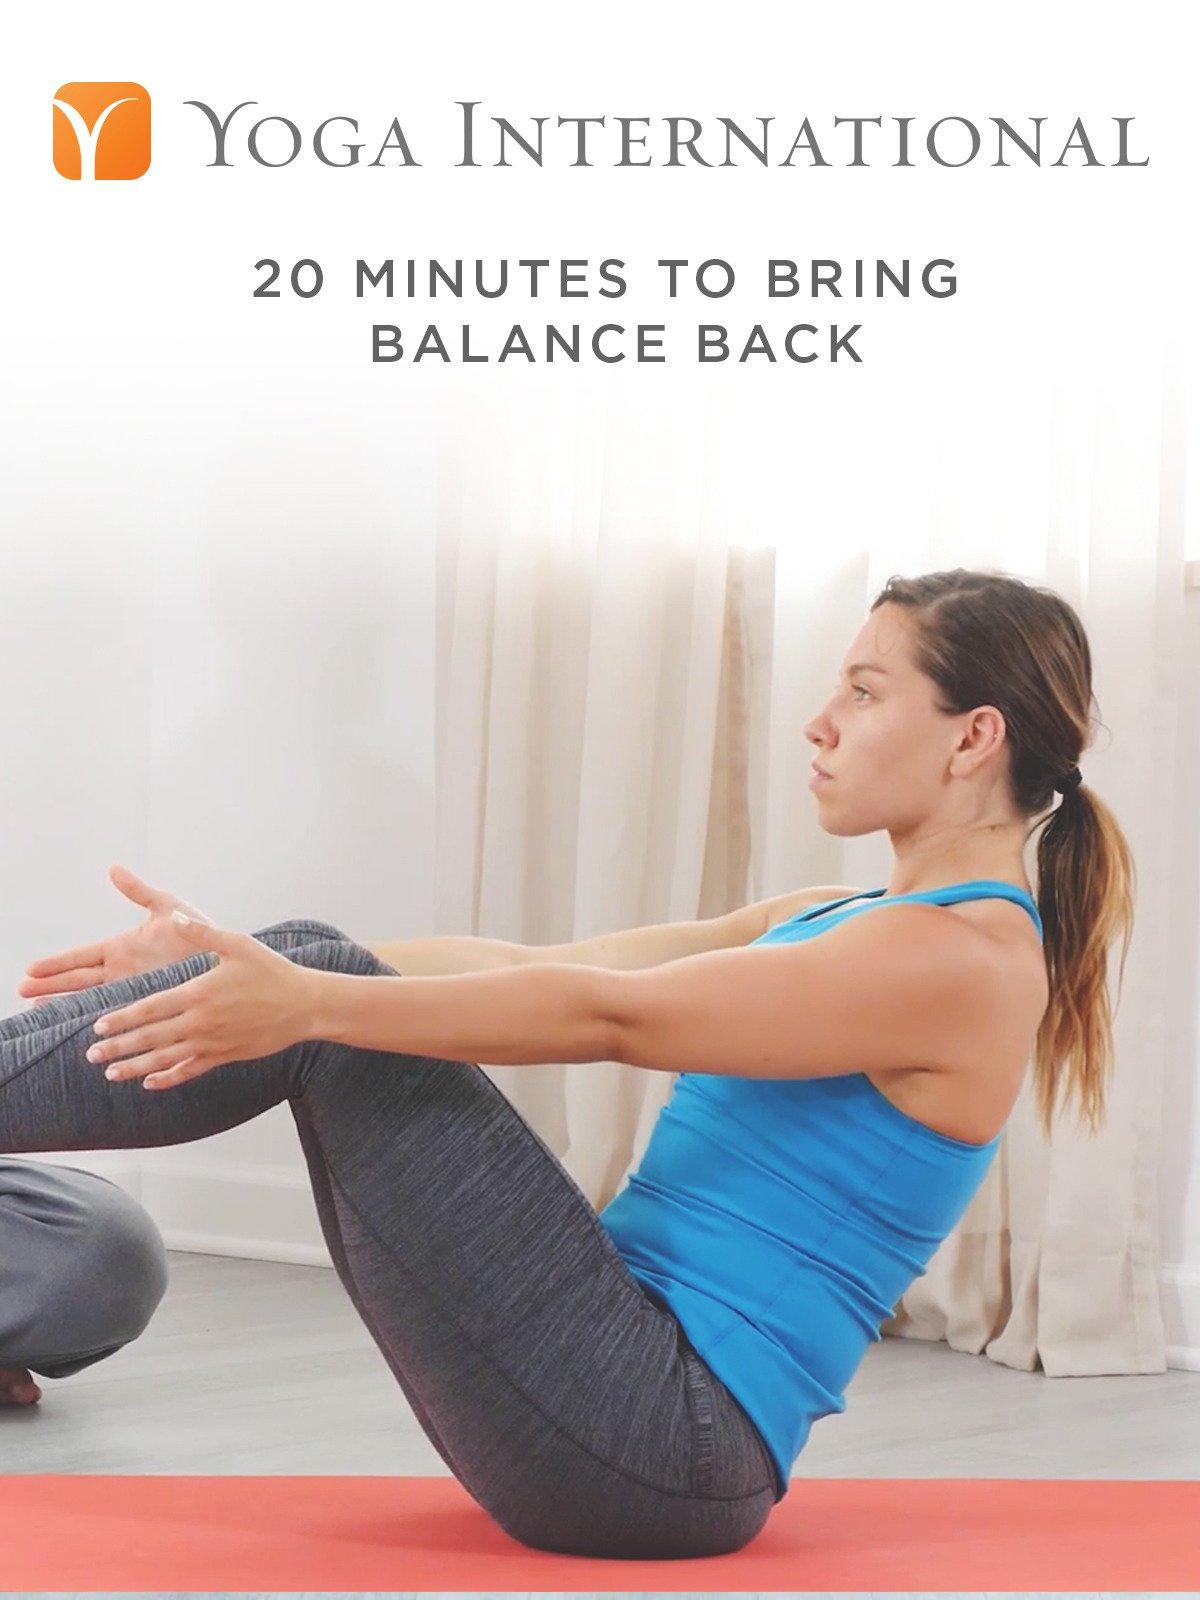 20 Minutes to Bring Balance Back